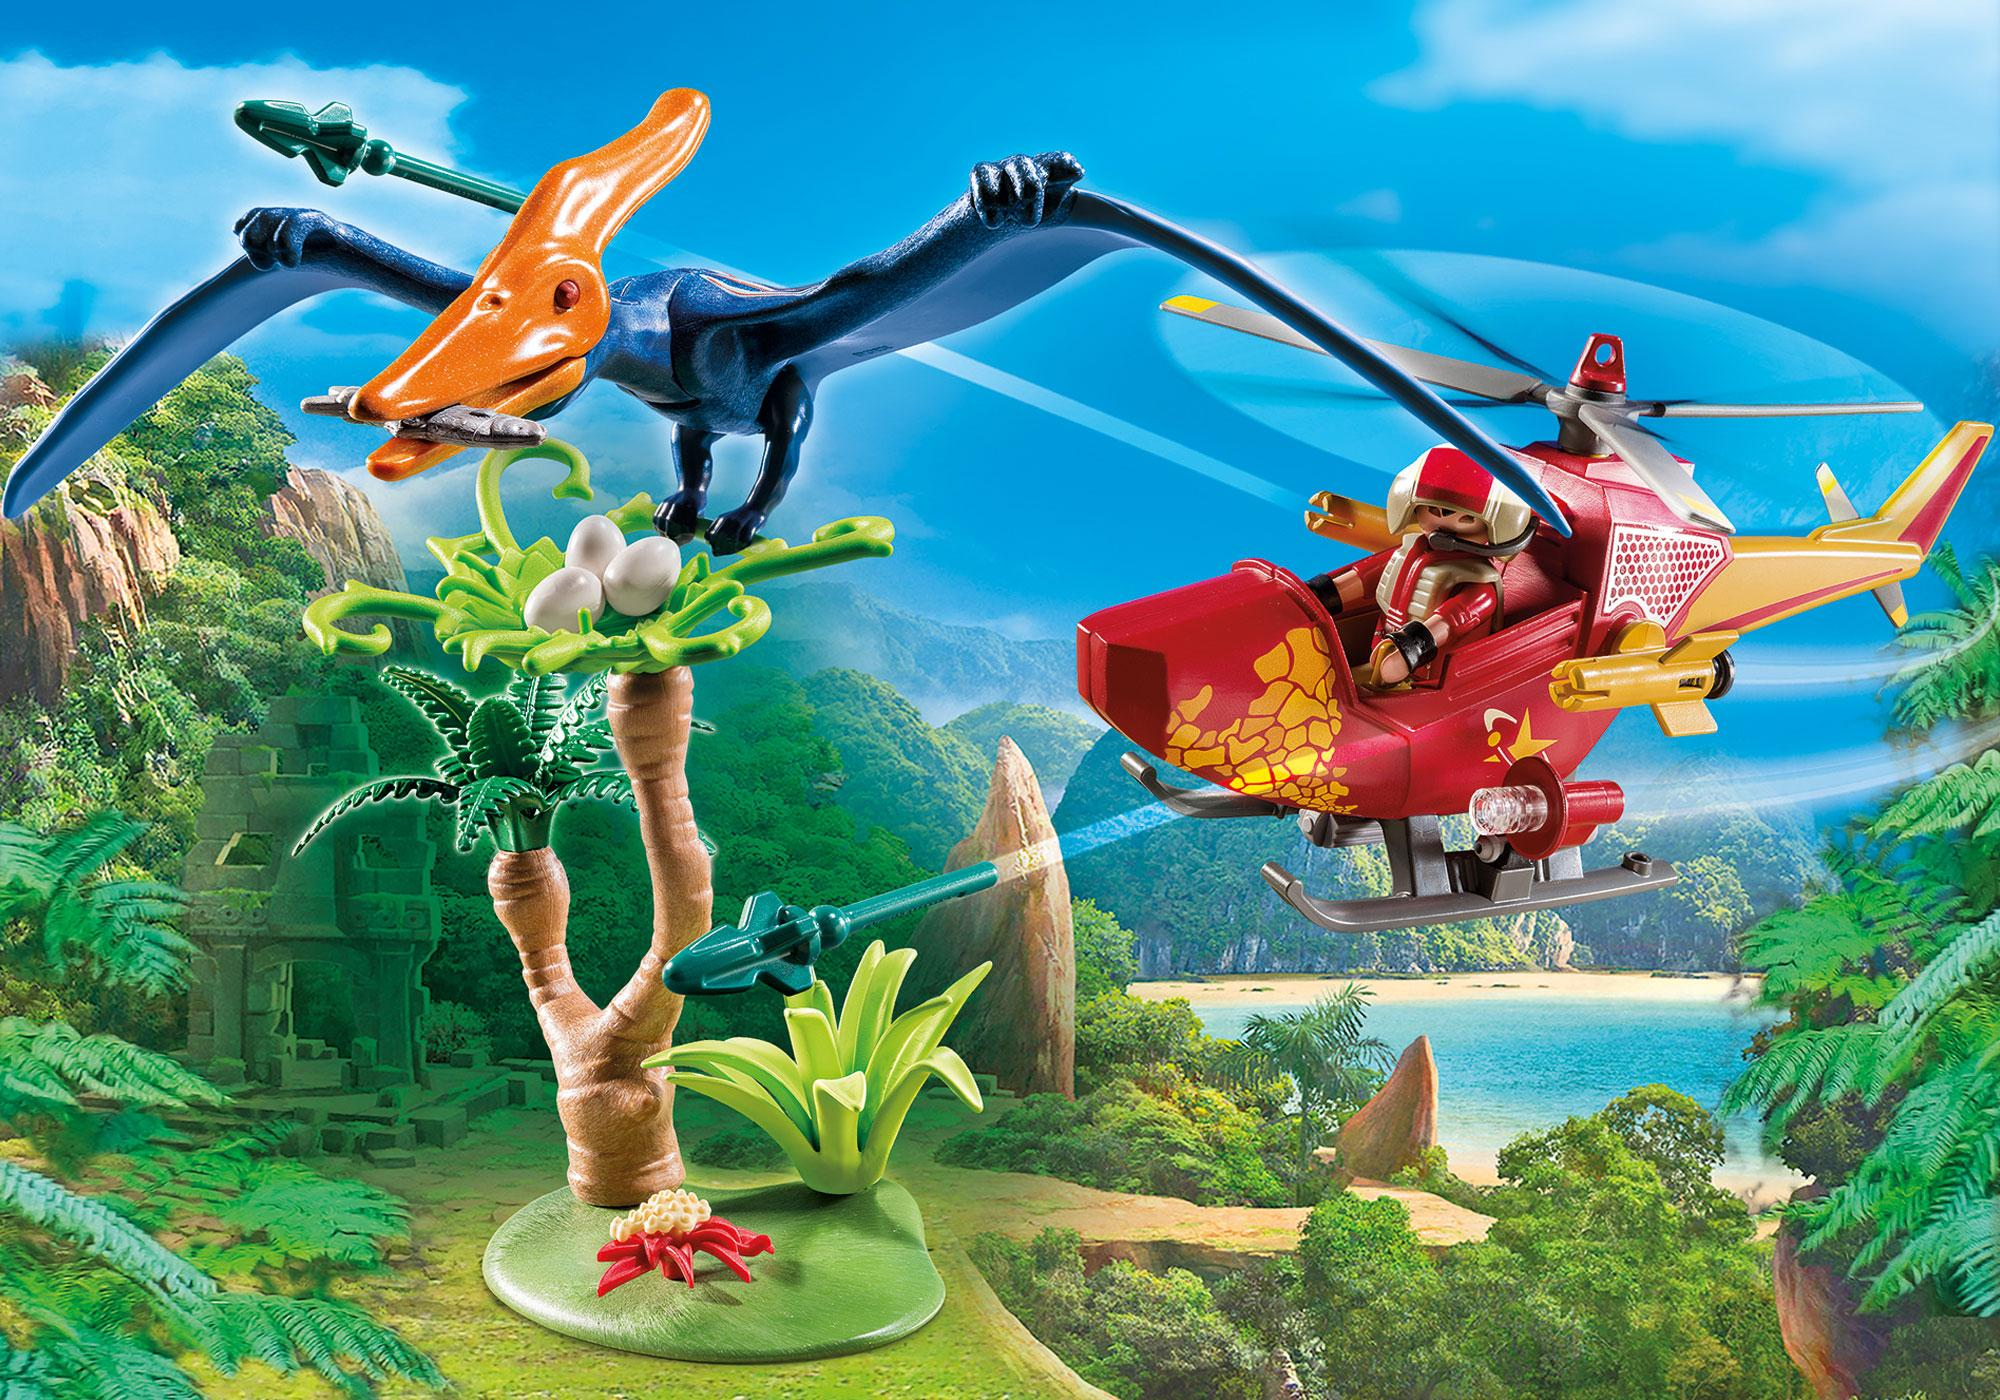 9430_product_detail/Helicóptero con Pterosaurio